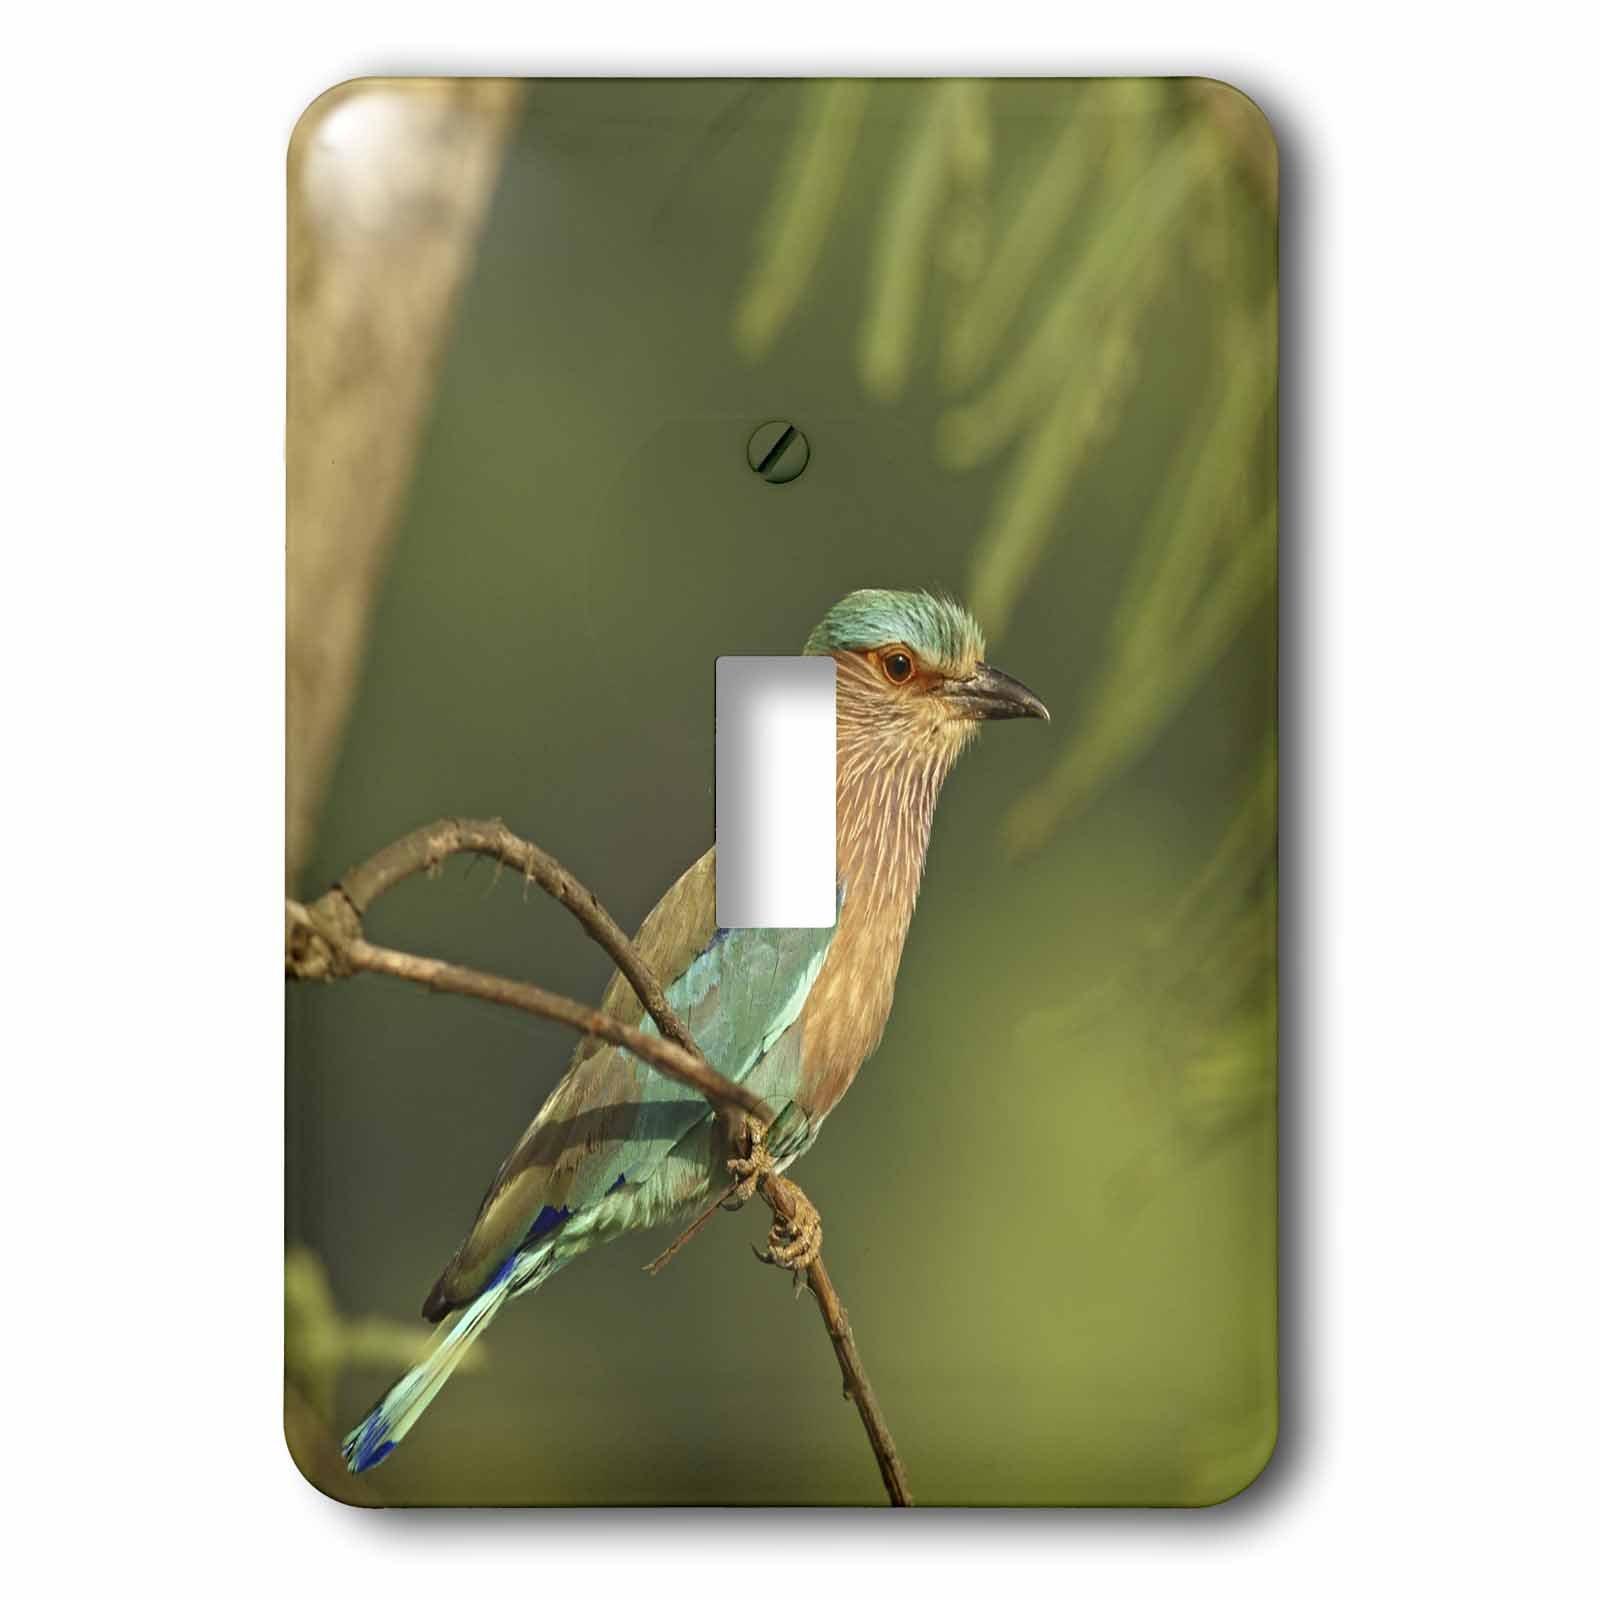 3dRose lsp_70543_1 Indian Roller Bird, Corbett Np, Uttaranchal, India-As10 Jra0089 Jagdeep Rajput Single Toggle Switch